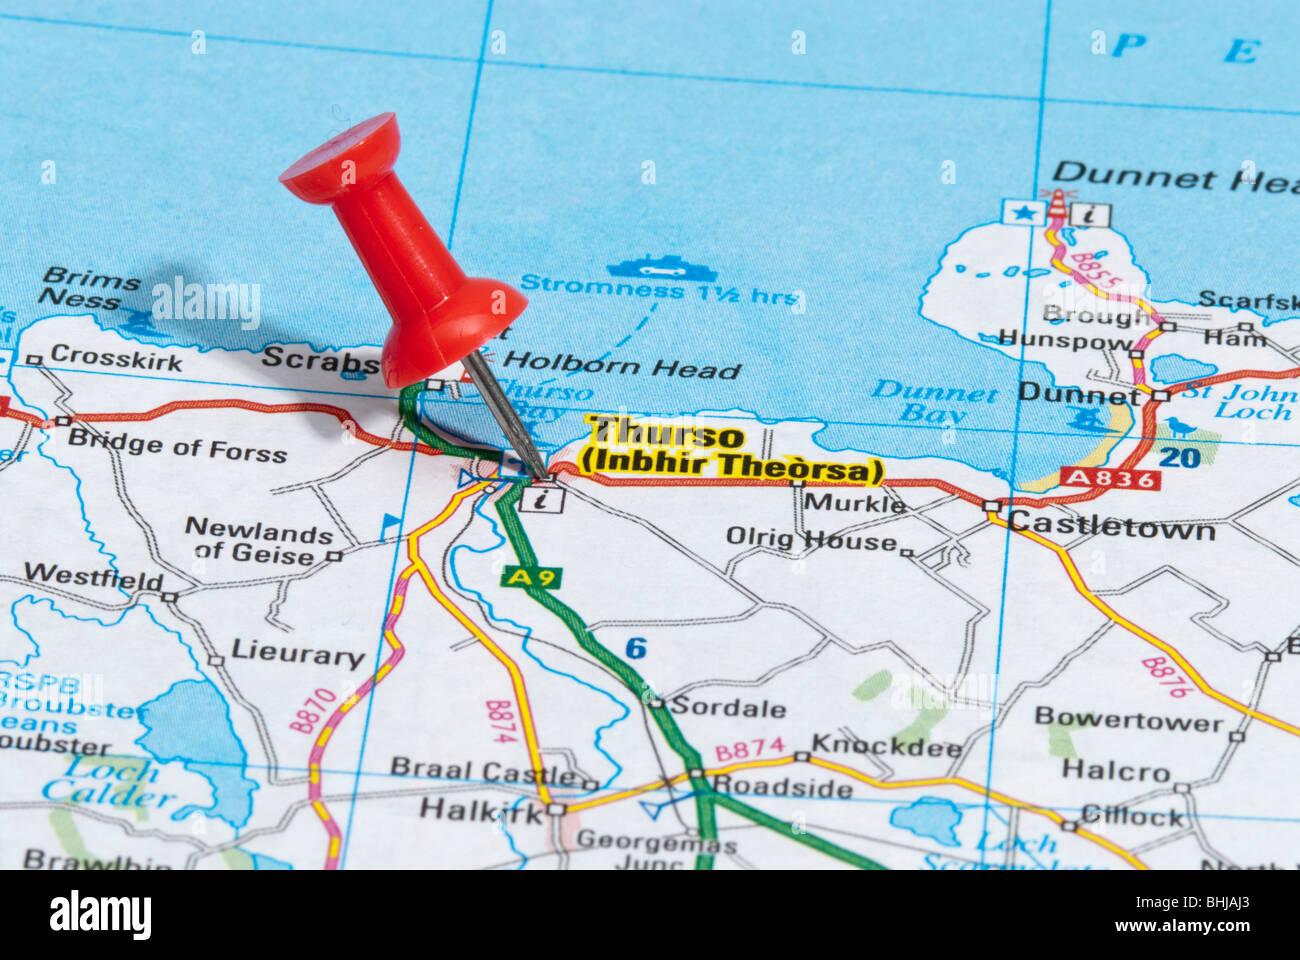 Caithness scotland road stock photos caithness scotland road red map pin in road map pointing to city of thurso stock image pooptronica